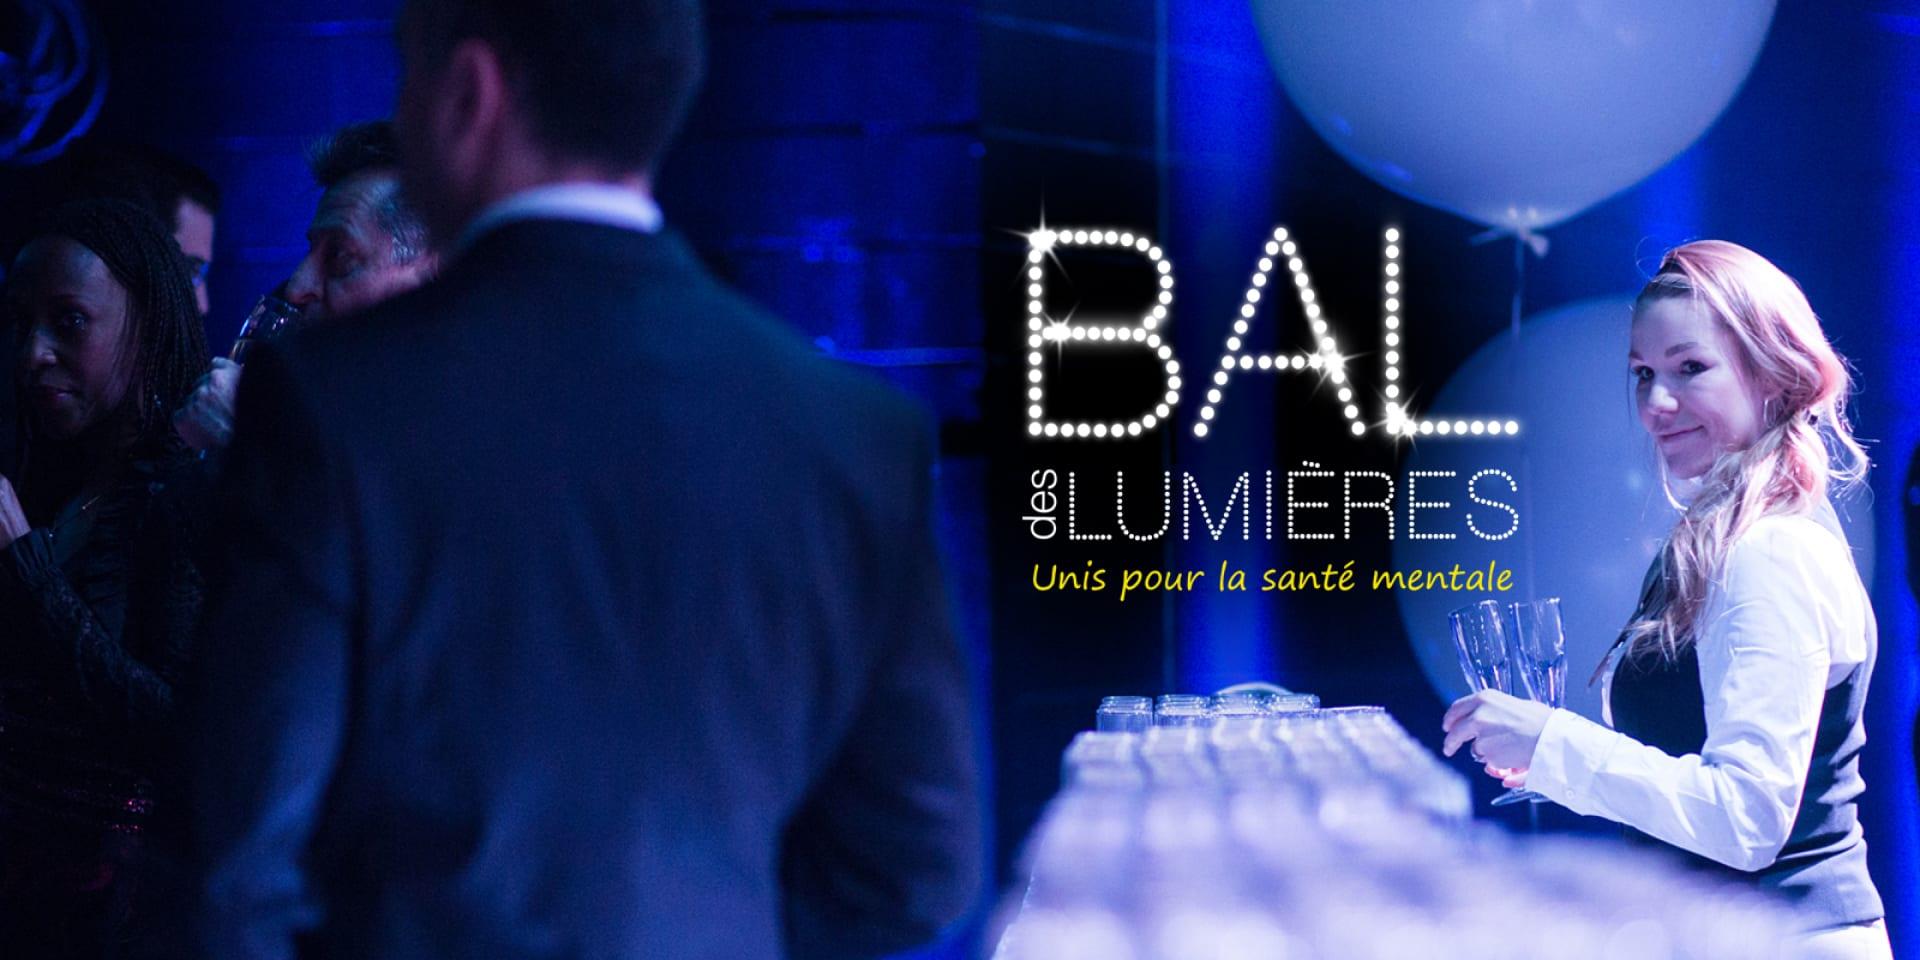 Date of Next Edition To Come: Bal des lumières